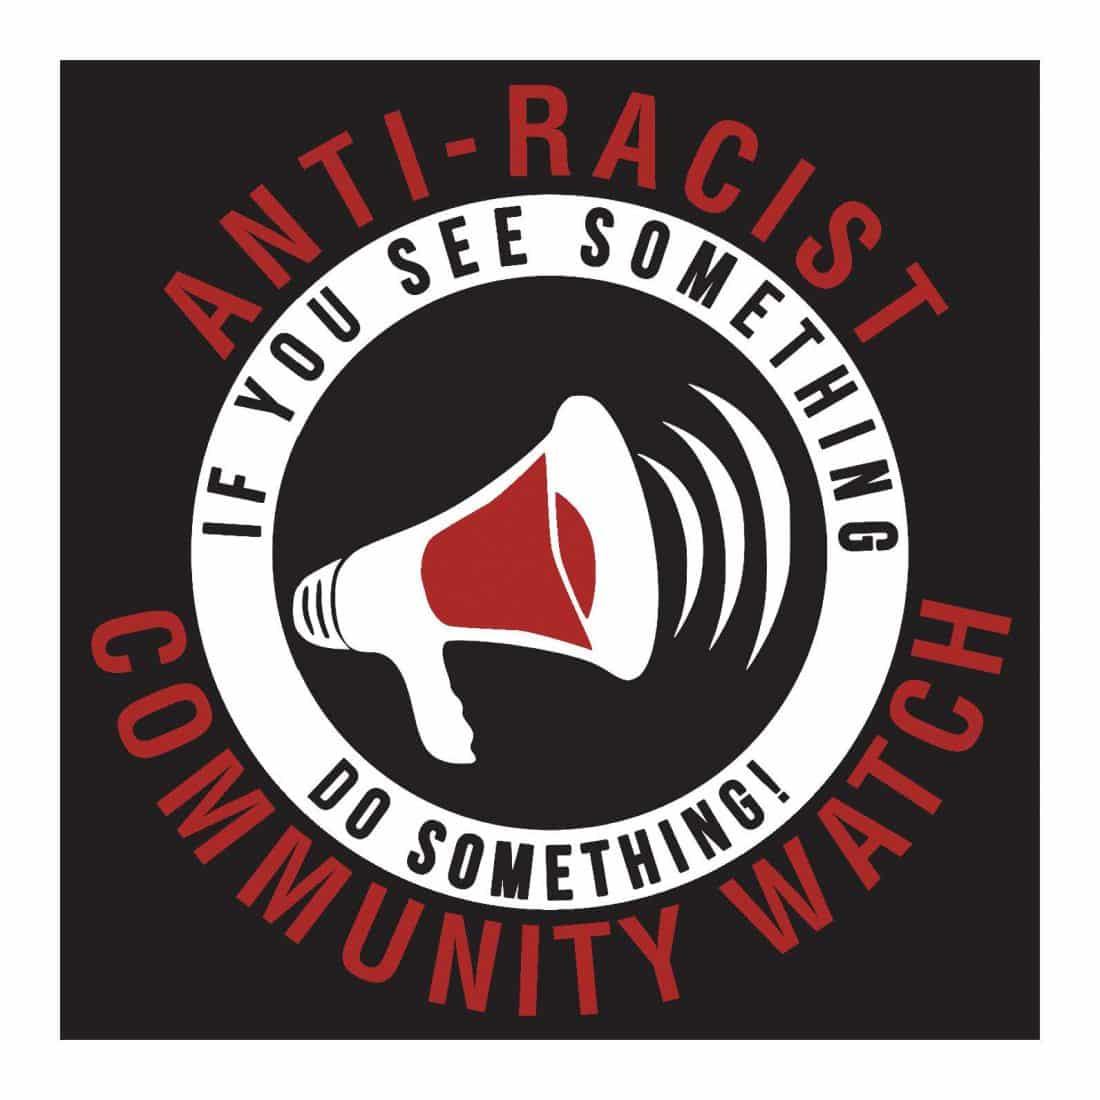 Anti-Racist Neighborhood Watch Sticker | Civil Liberties Defense Center